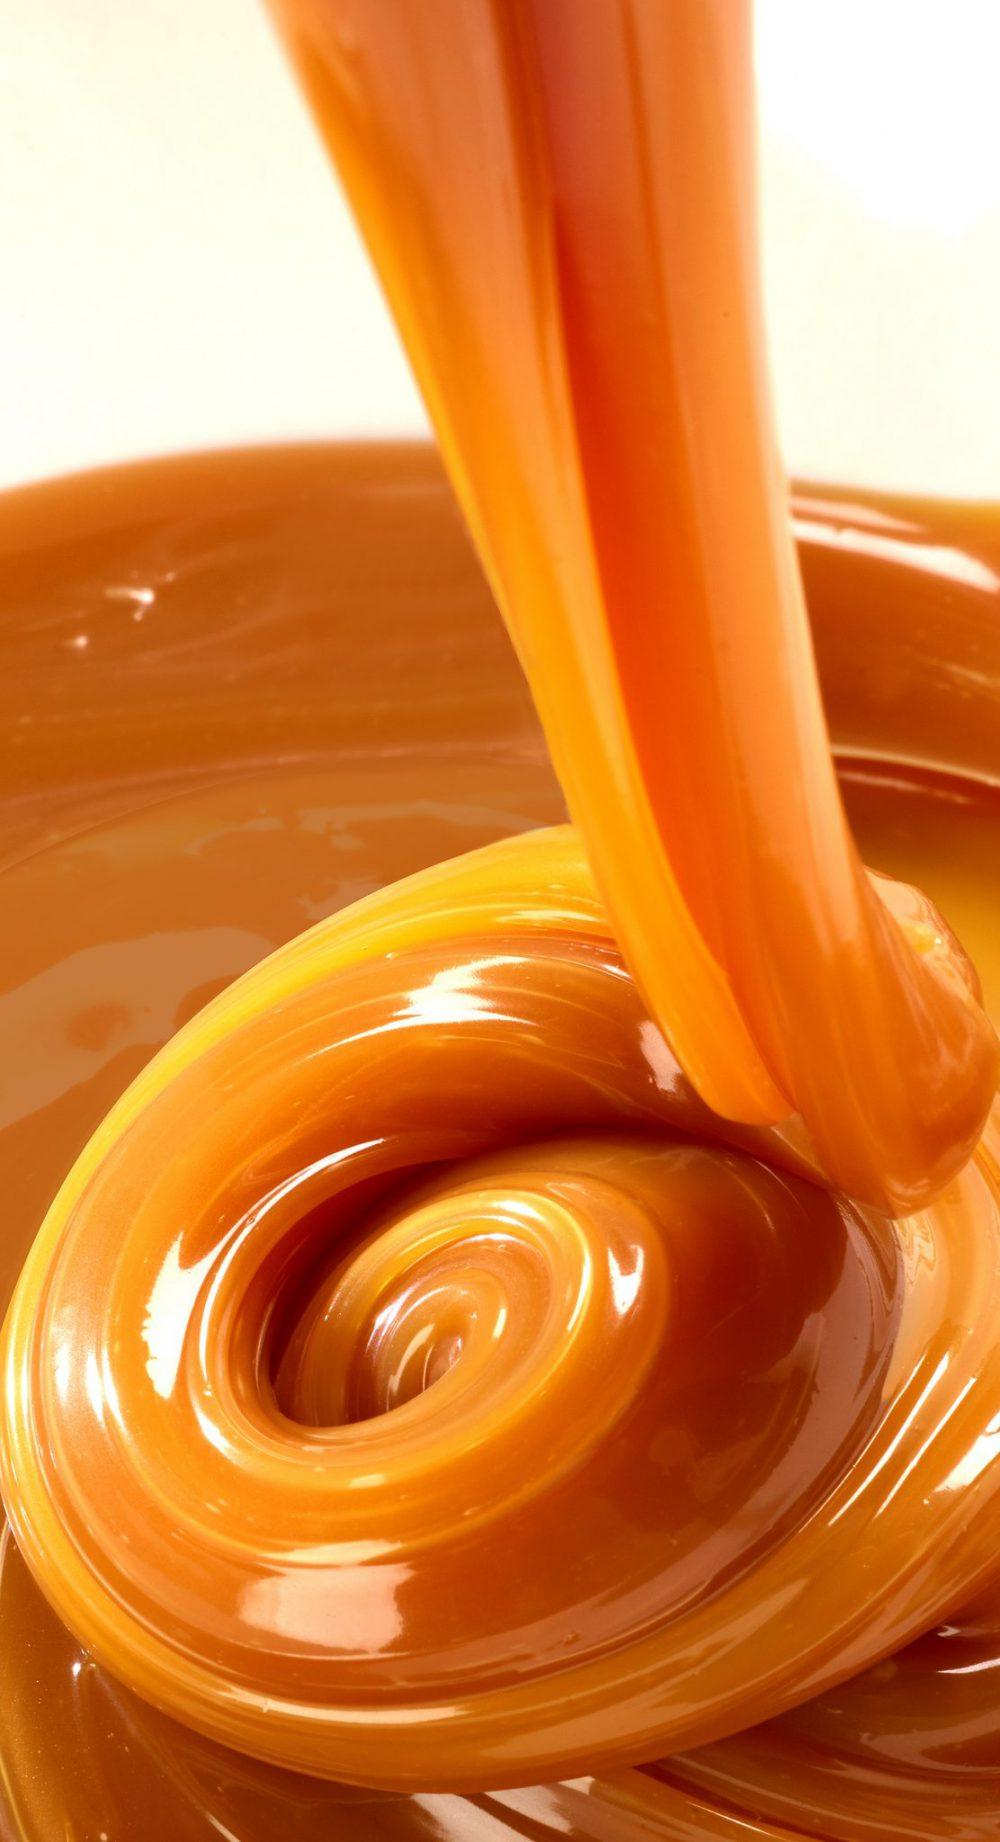 Swirls of Caramel